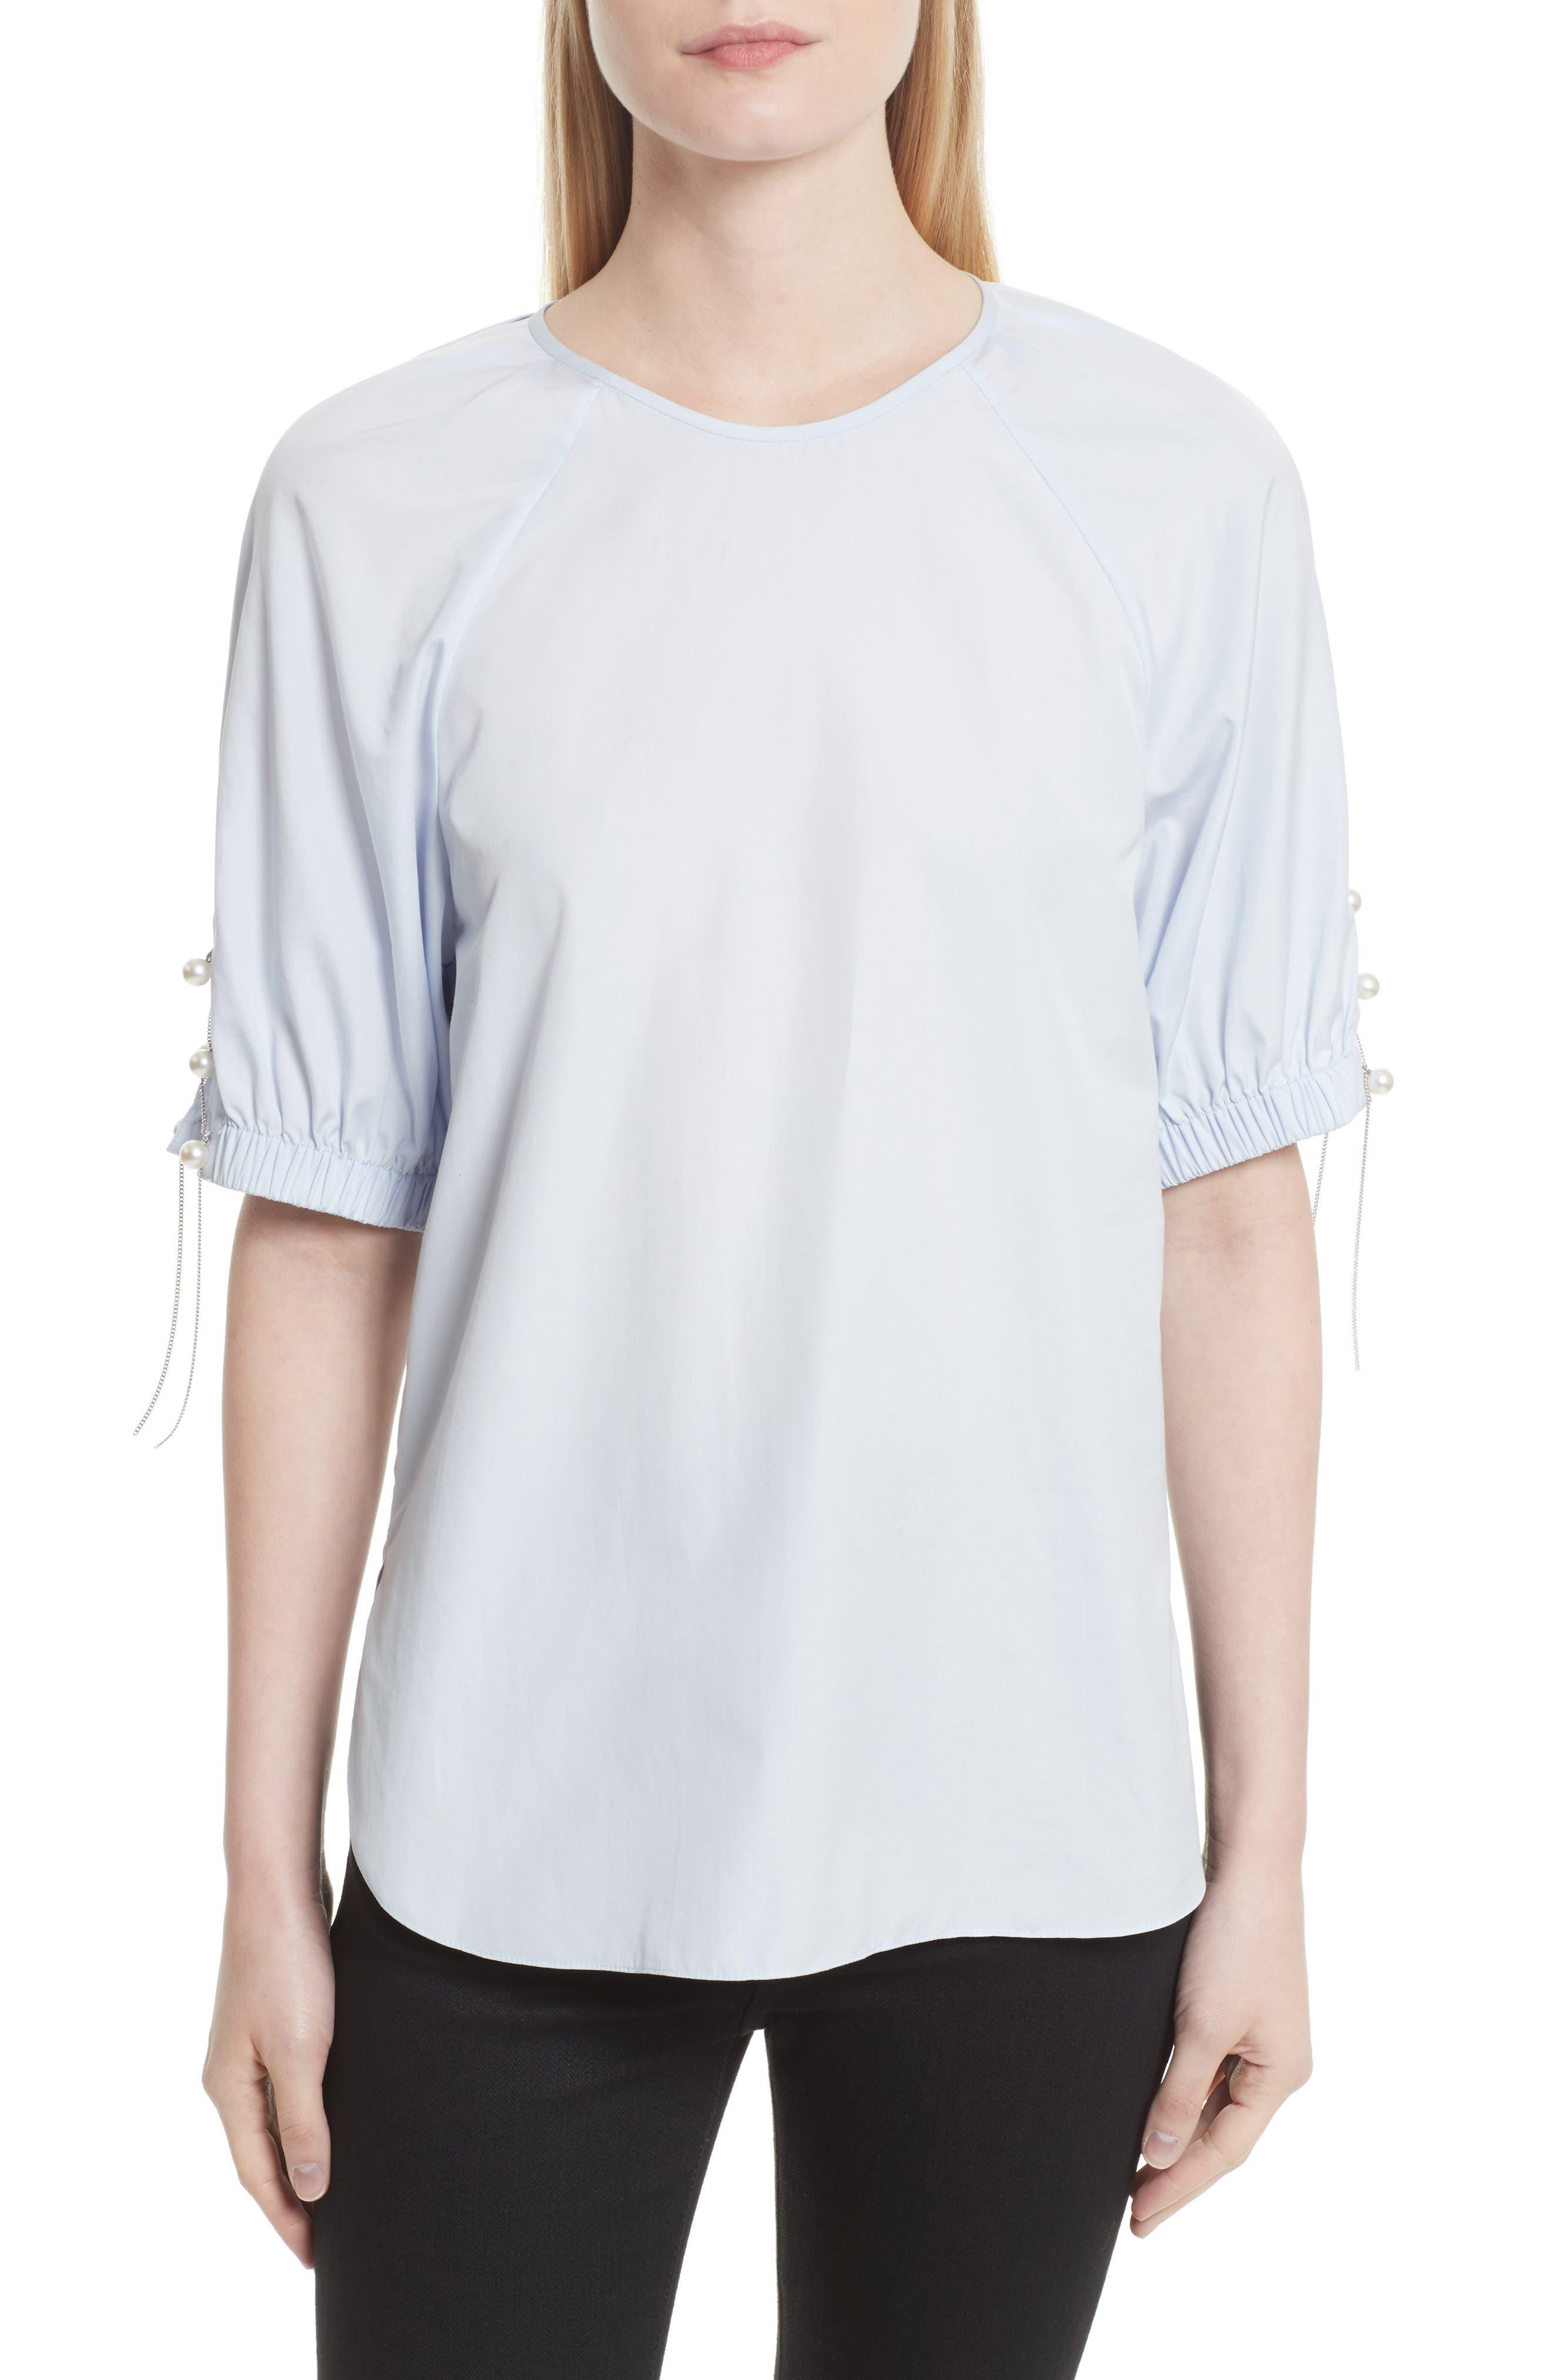 Main Image - 3.1 Phillip Lim Faux Pearl & Chain Lacing Cotton Top